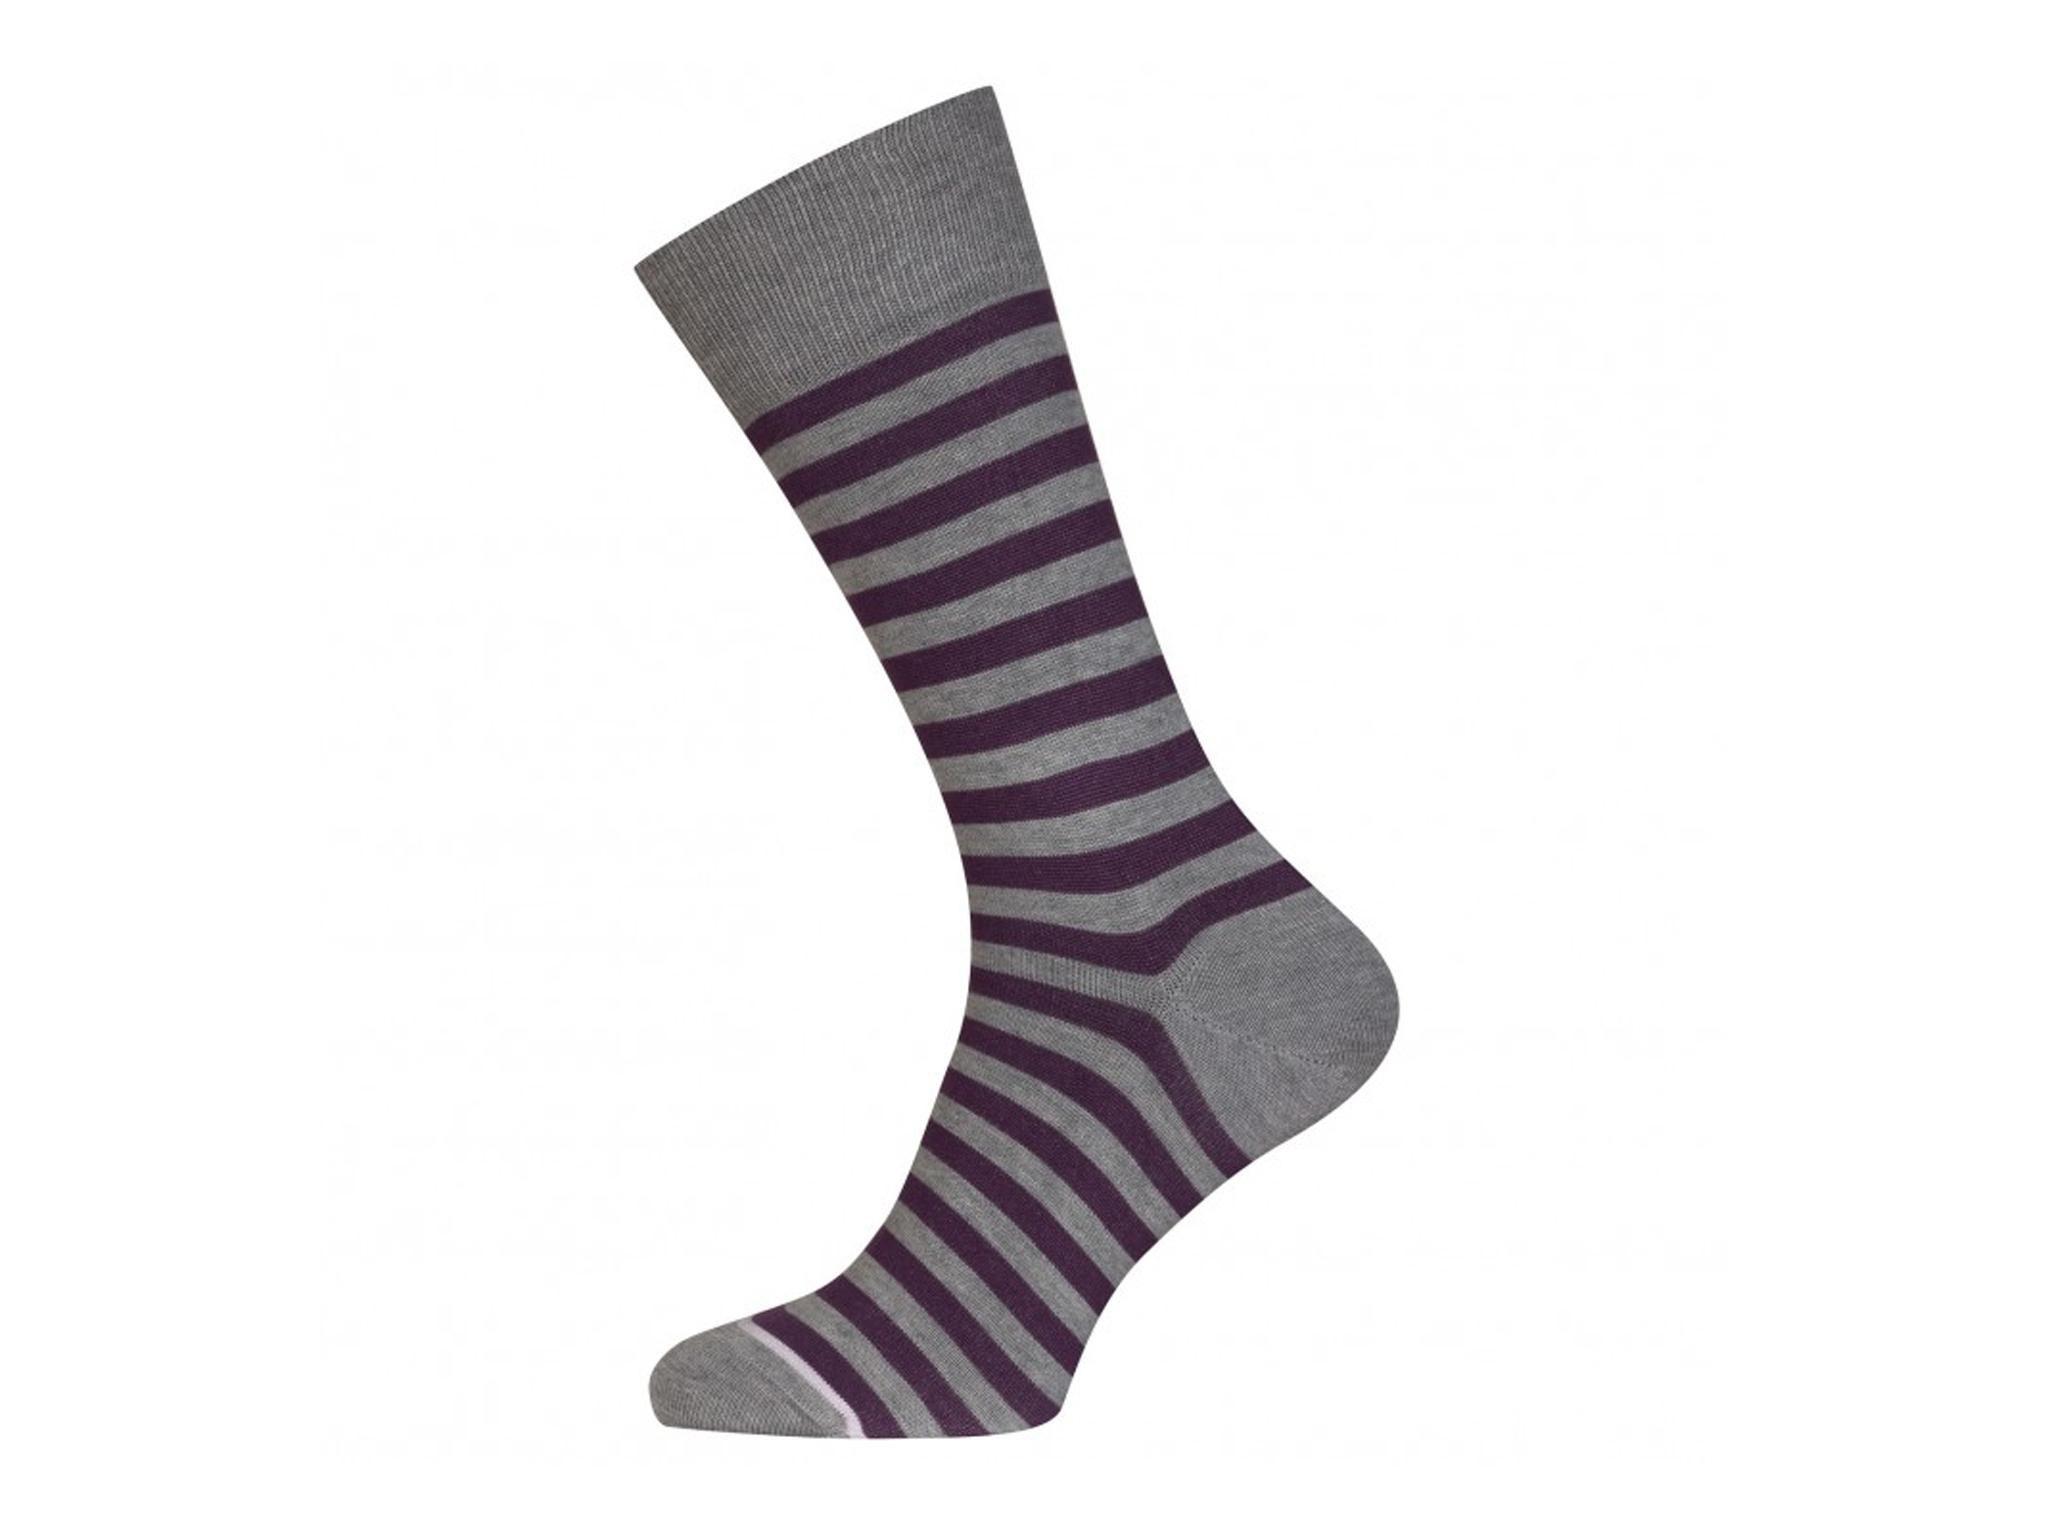 c397308a60d84 10 best men's socks   The Independent